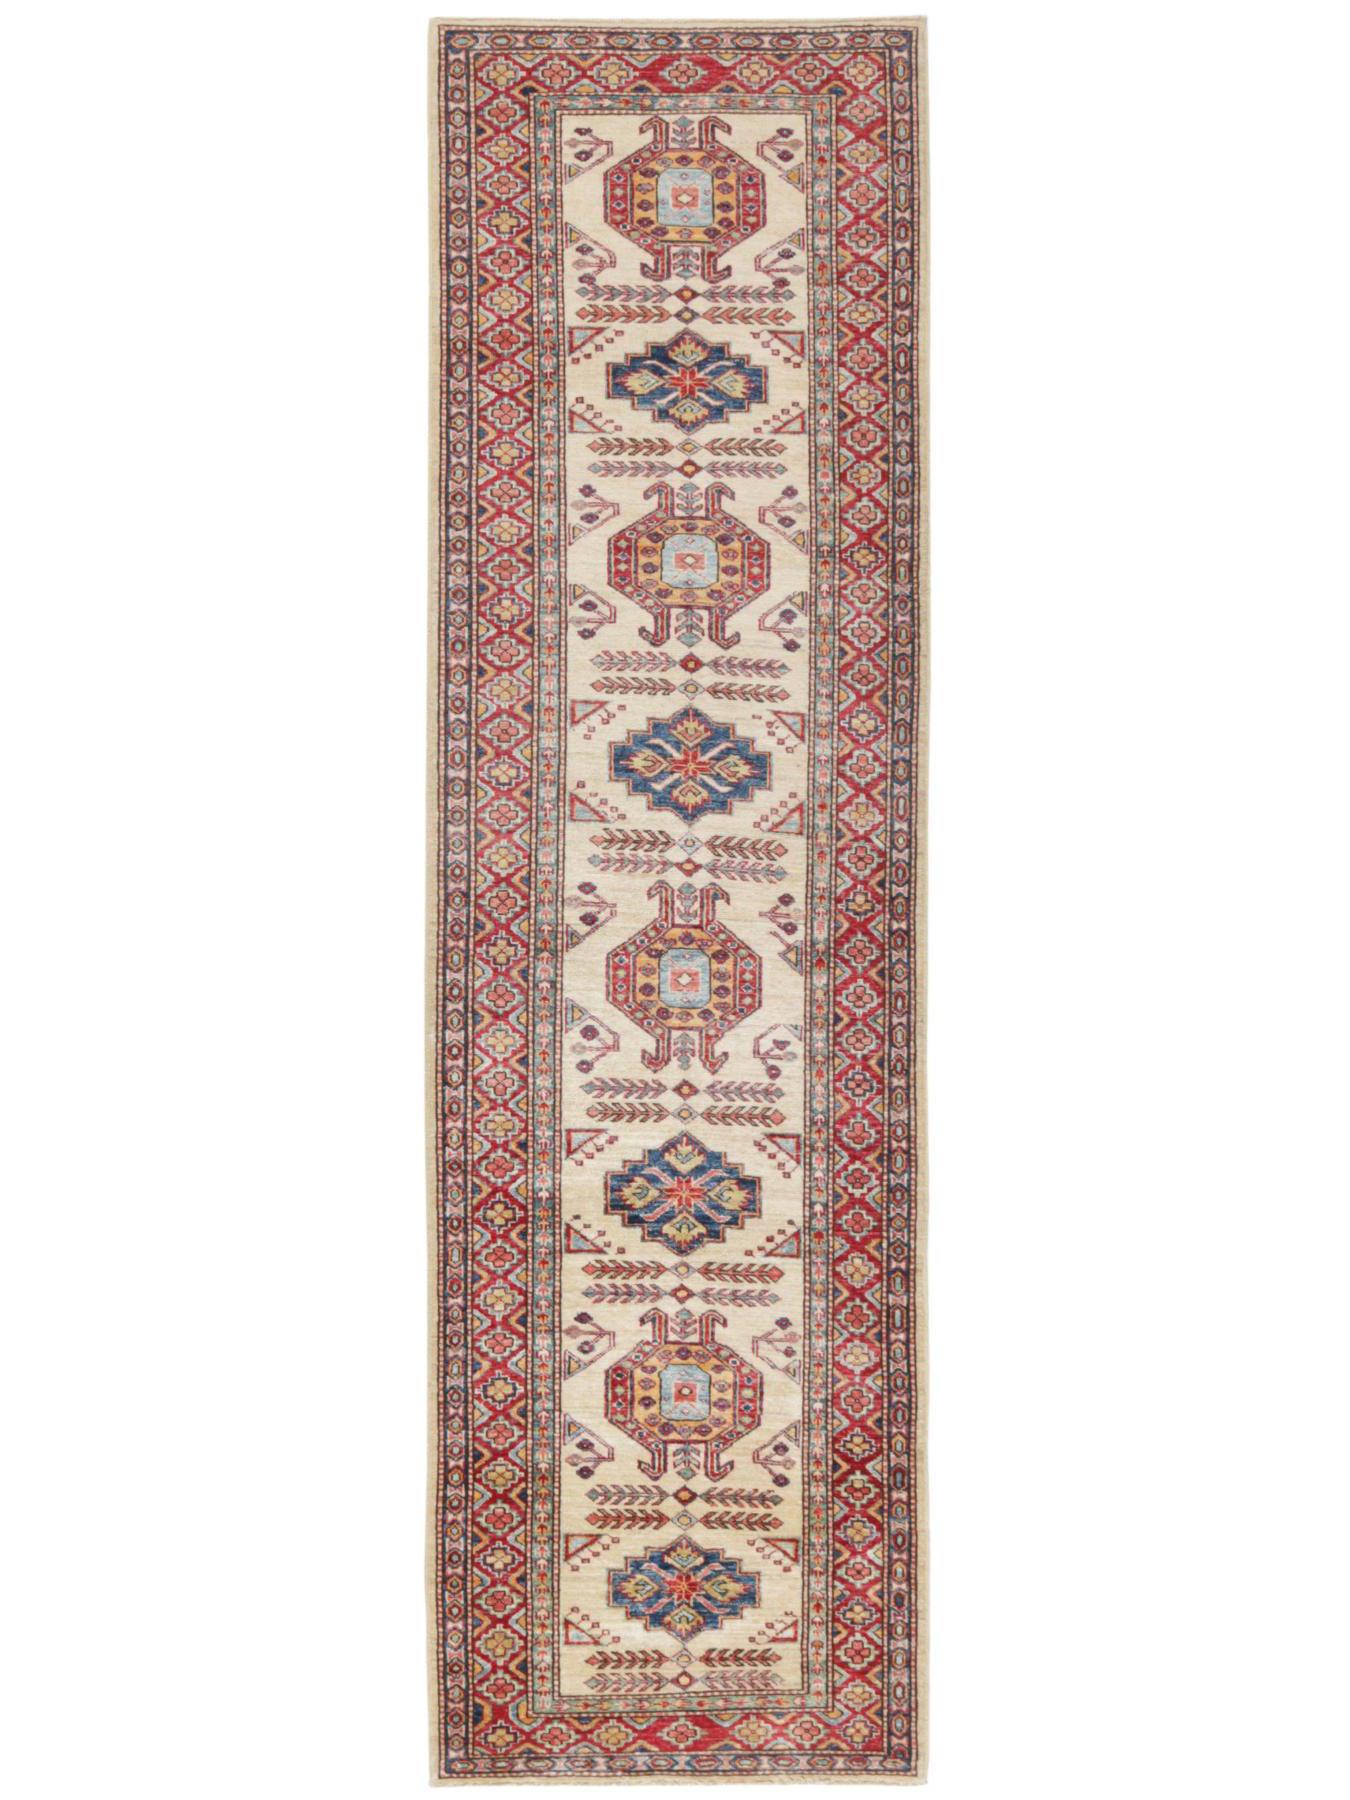 Tapis Ghazni-Kazak - Kazak Royal